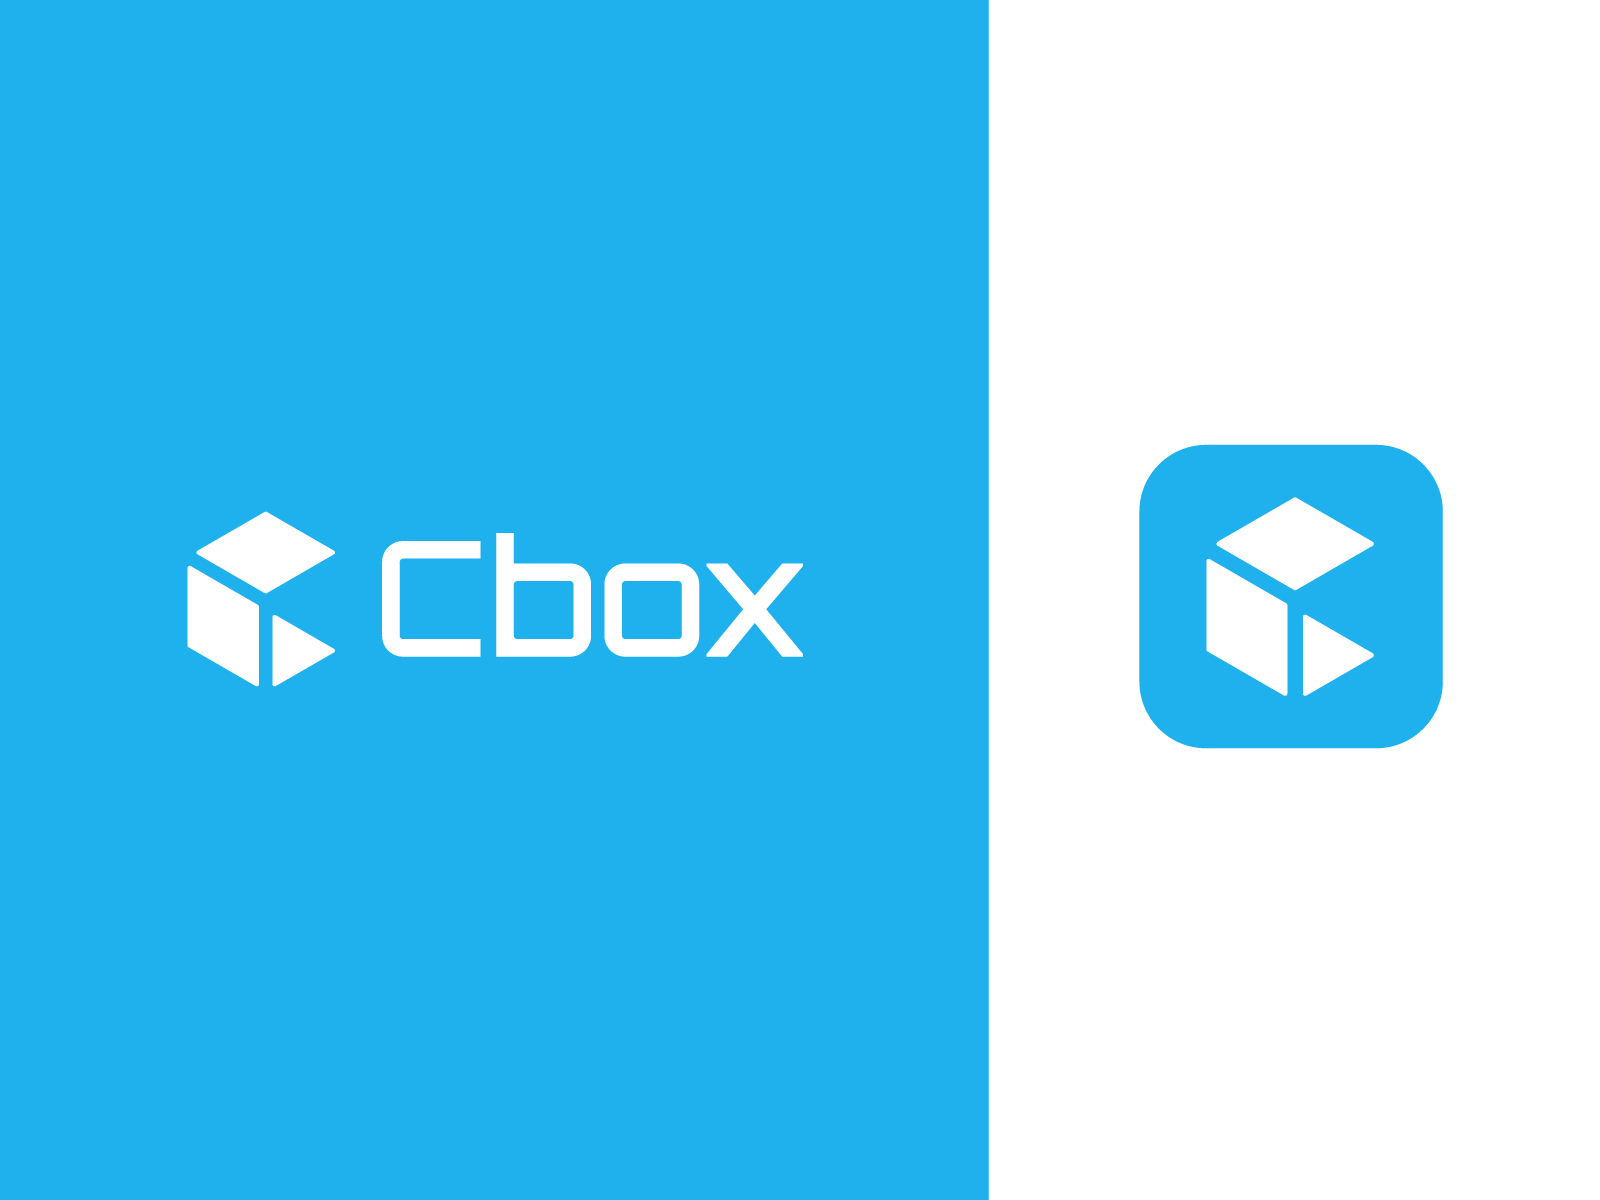 Cbox — Logo Design